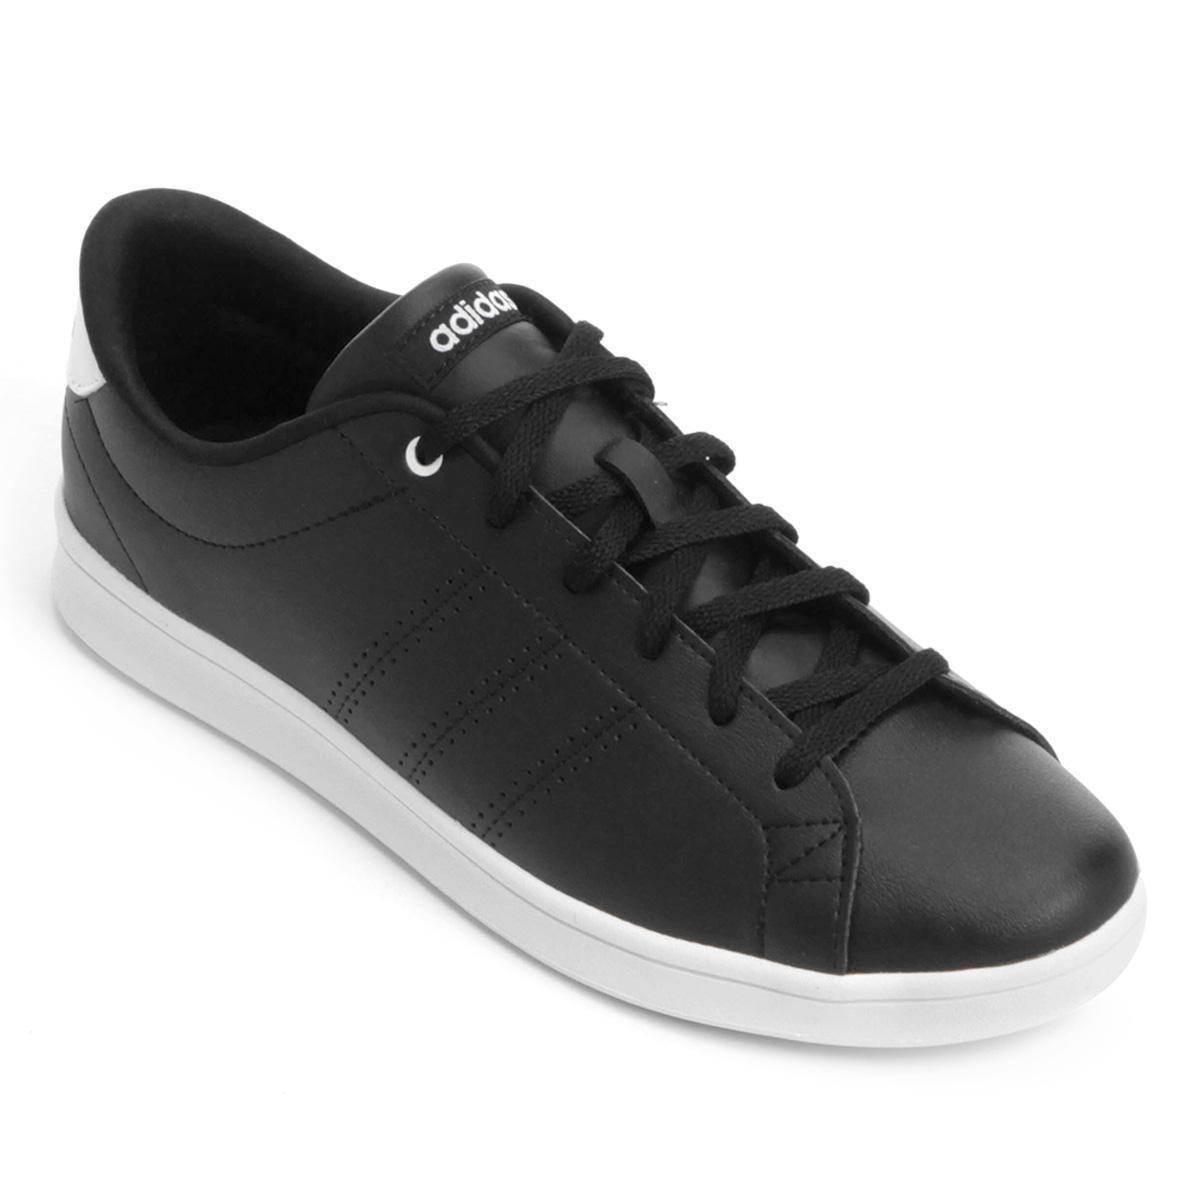 1ab35fc13d Tênis Adidas Advantage Clean Qt Feminino - Preto - Compre Agora ...